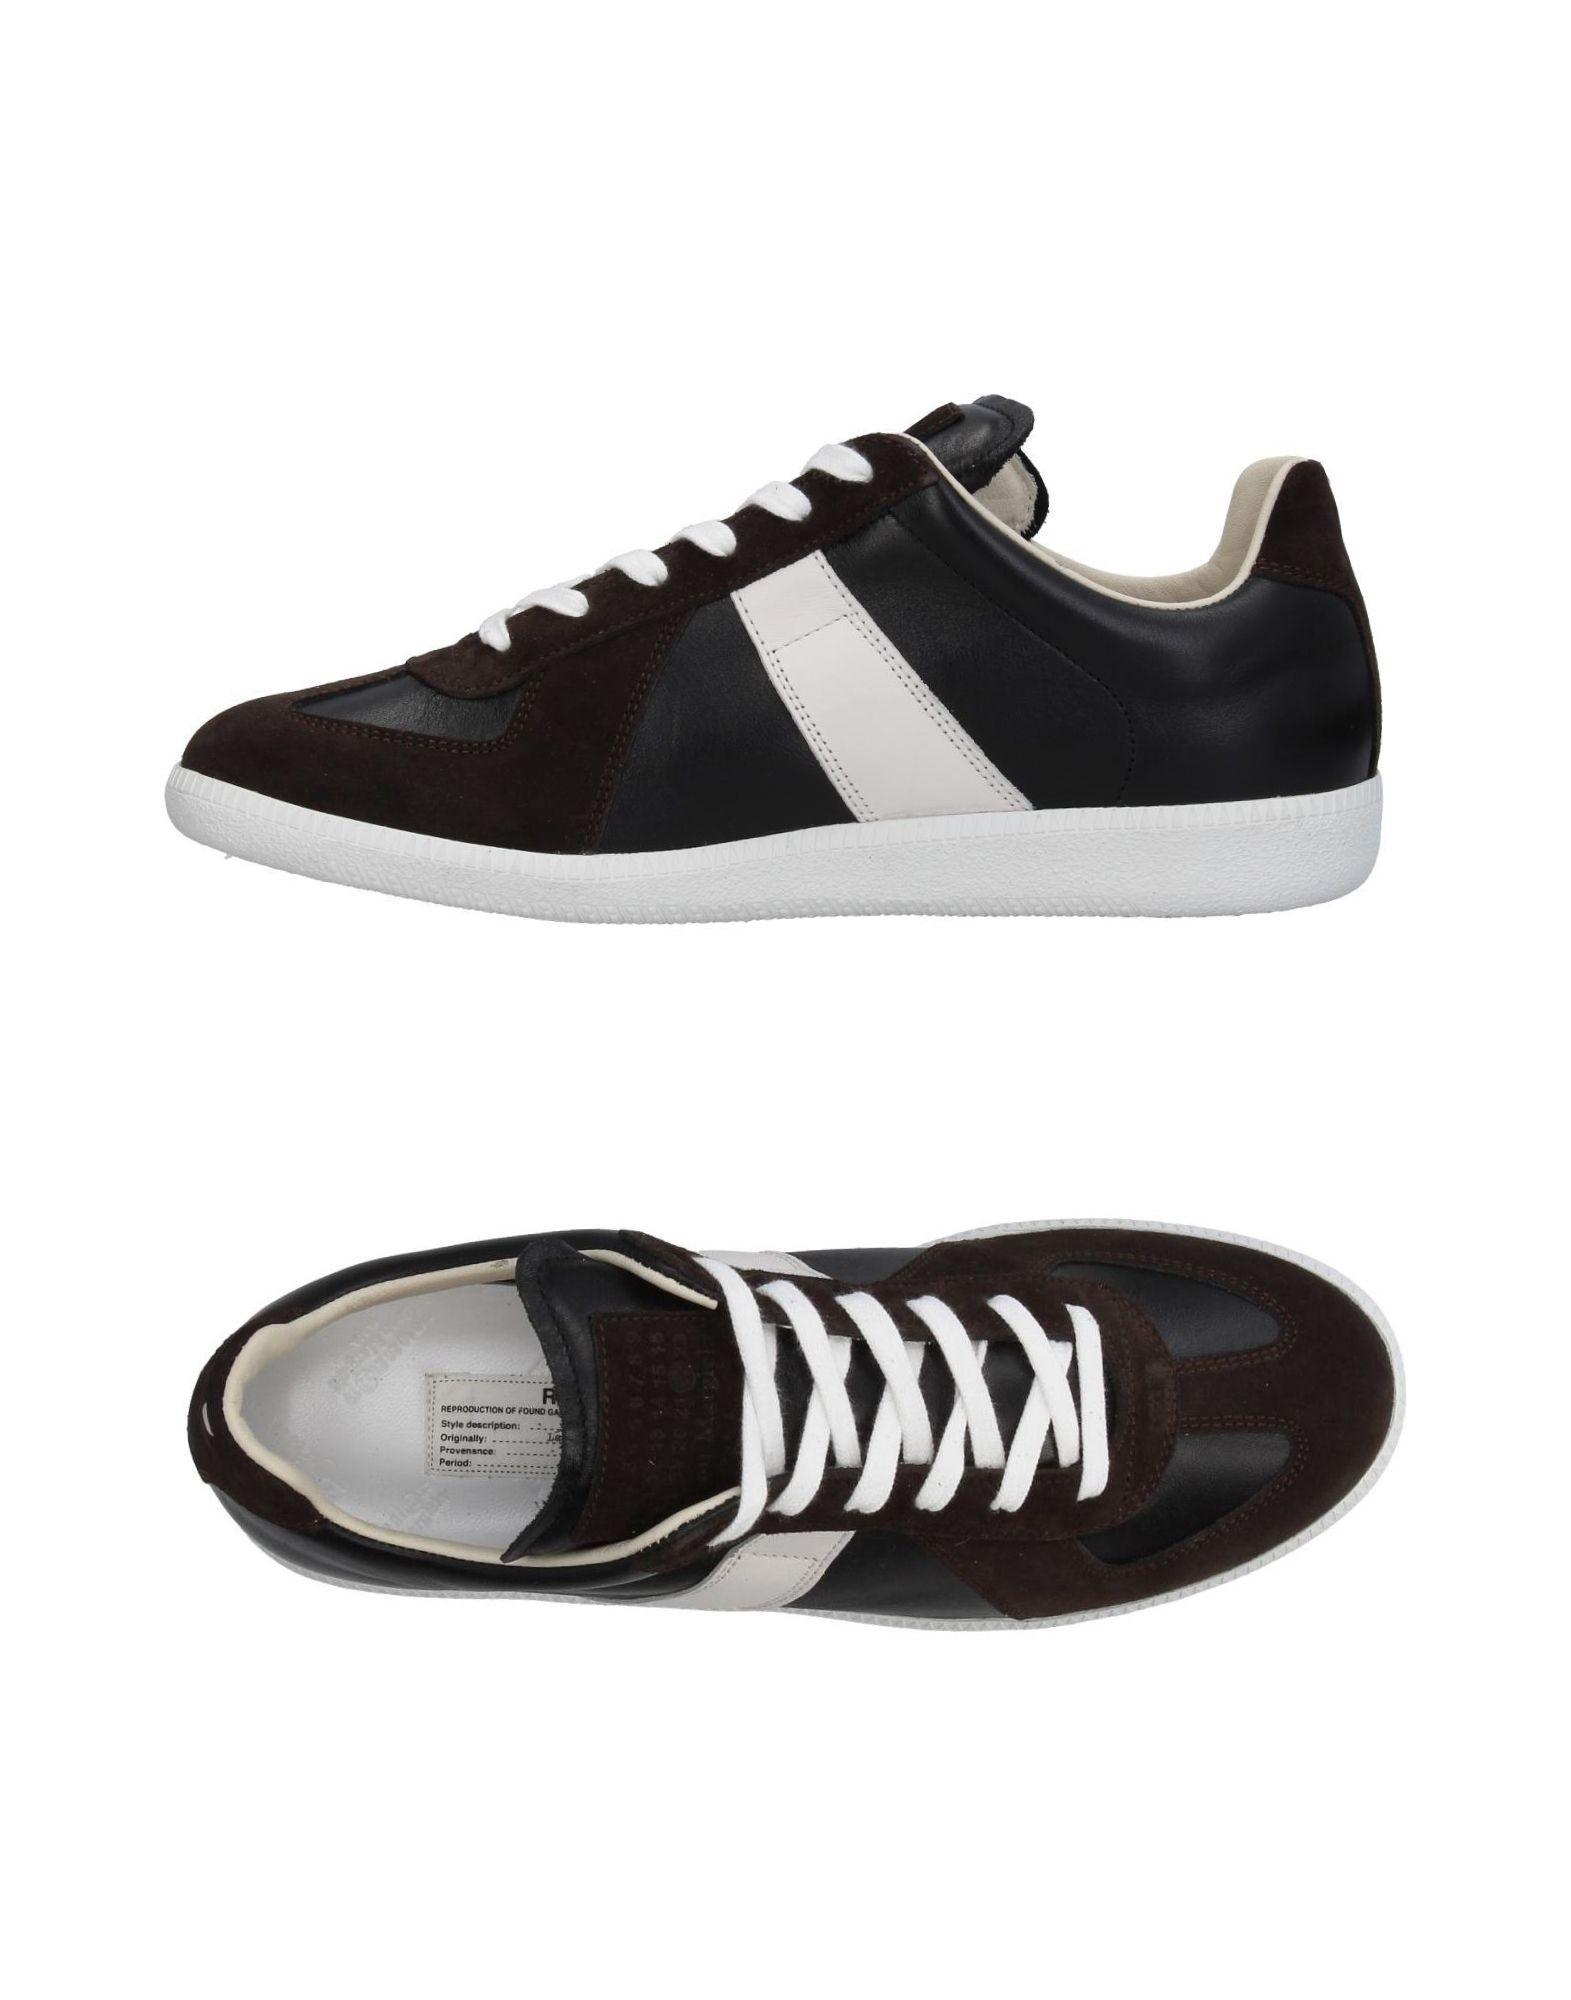 Maison Margiela Sneakers Herren  11379118BA Gute Qualität beliebte Schuhe